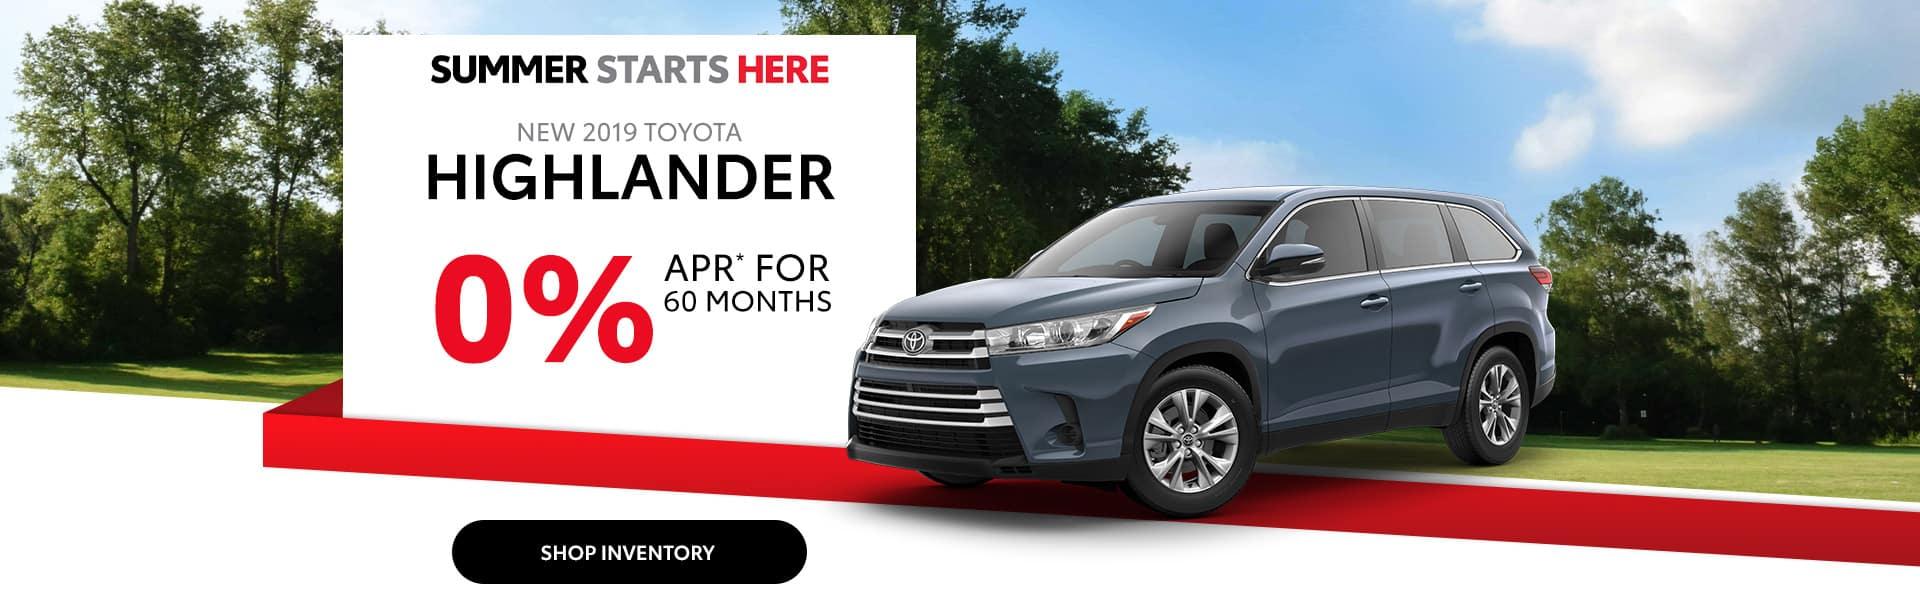 Finance a Toyota Highlander near Greenwood, Indiana.